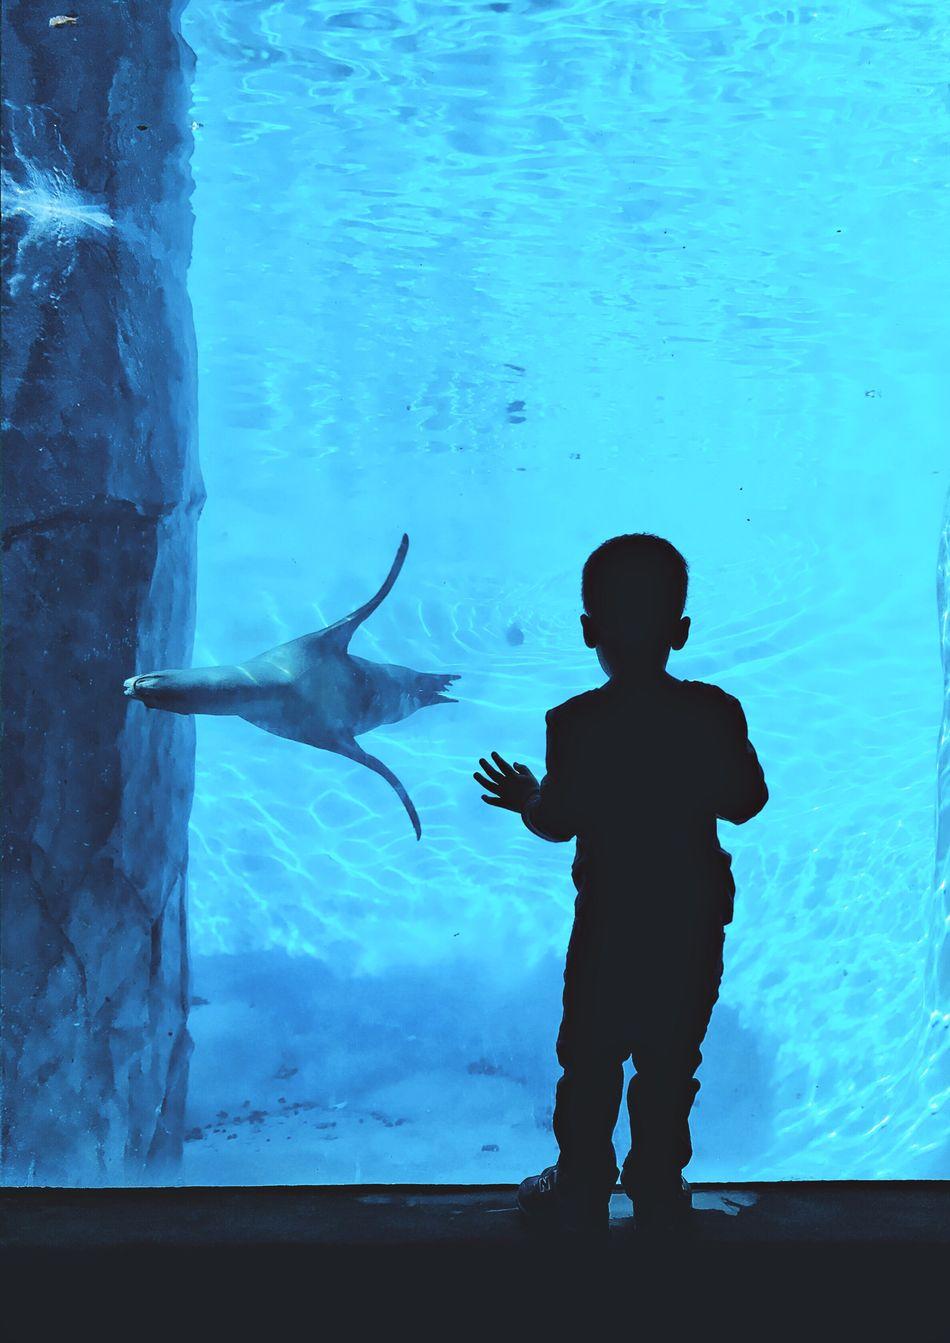 Underwater Dreamer Light And Reflection EyeEm Best Shots EyeEmBestPics EliotAndres Silhouette Underwater Maximum Closeness